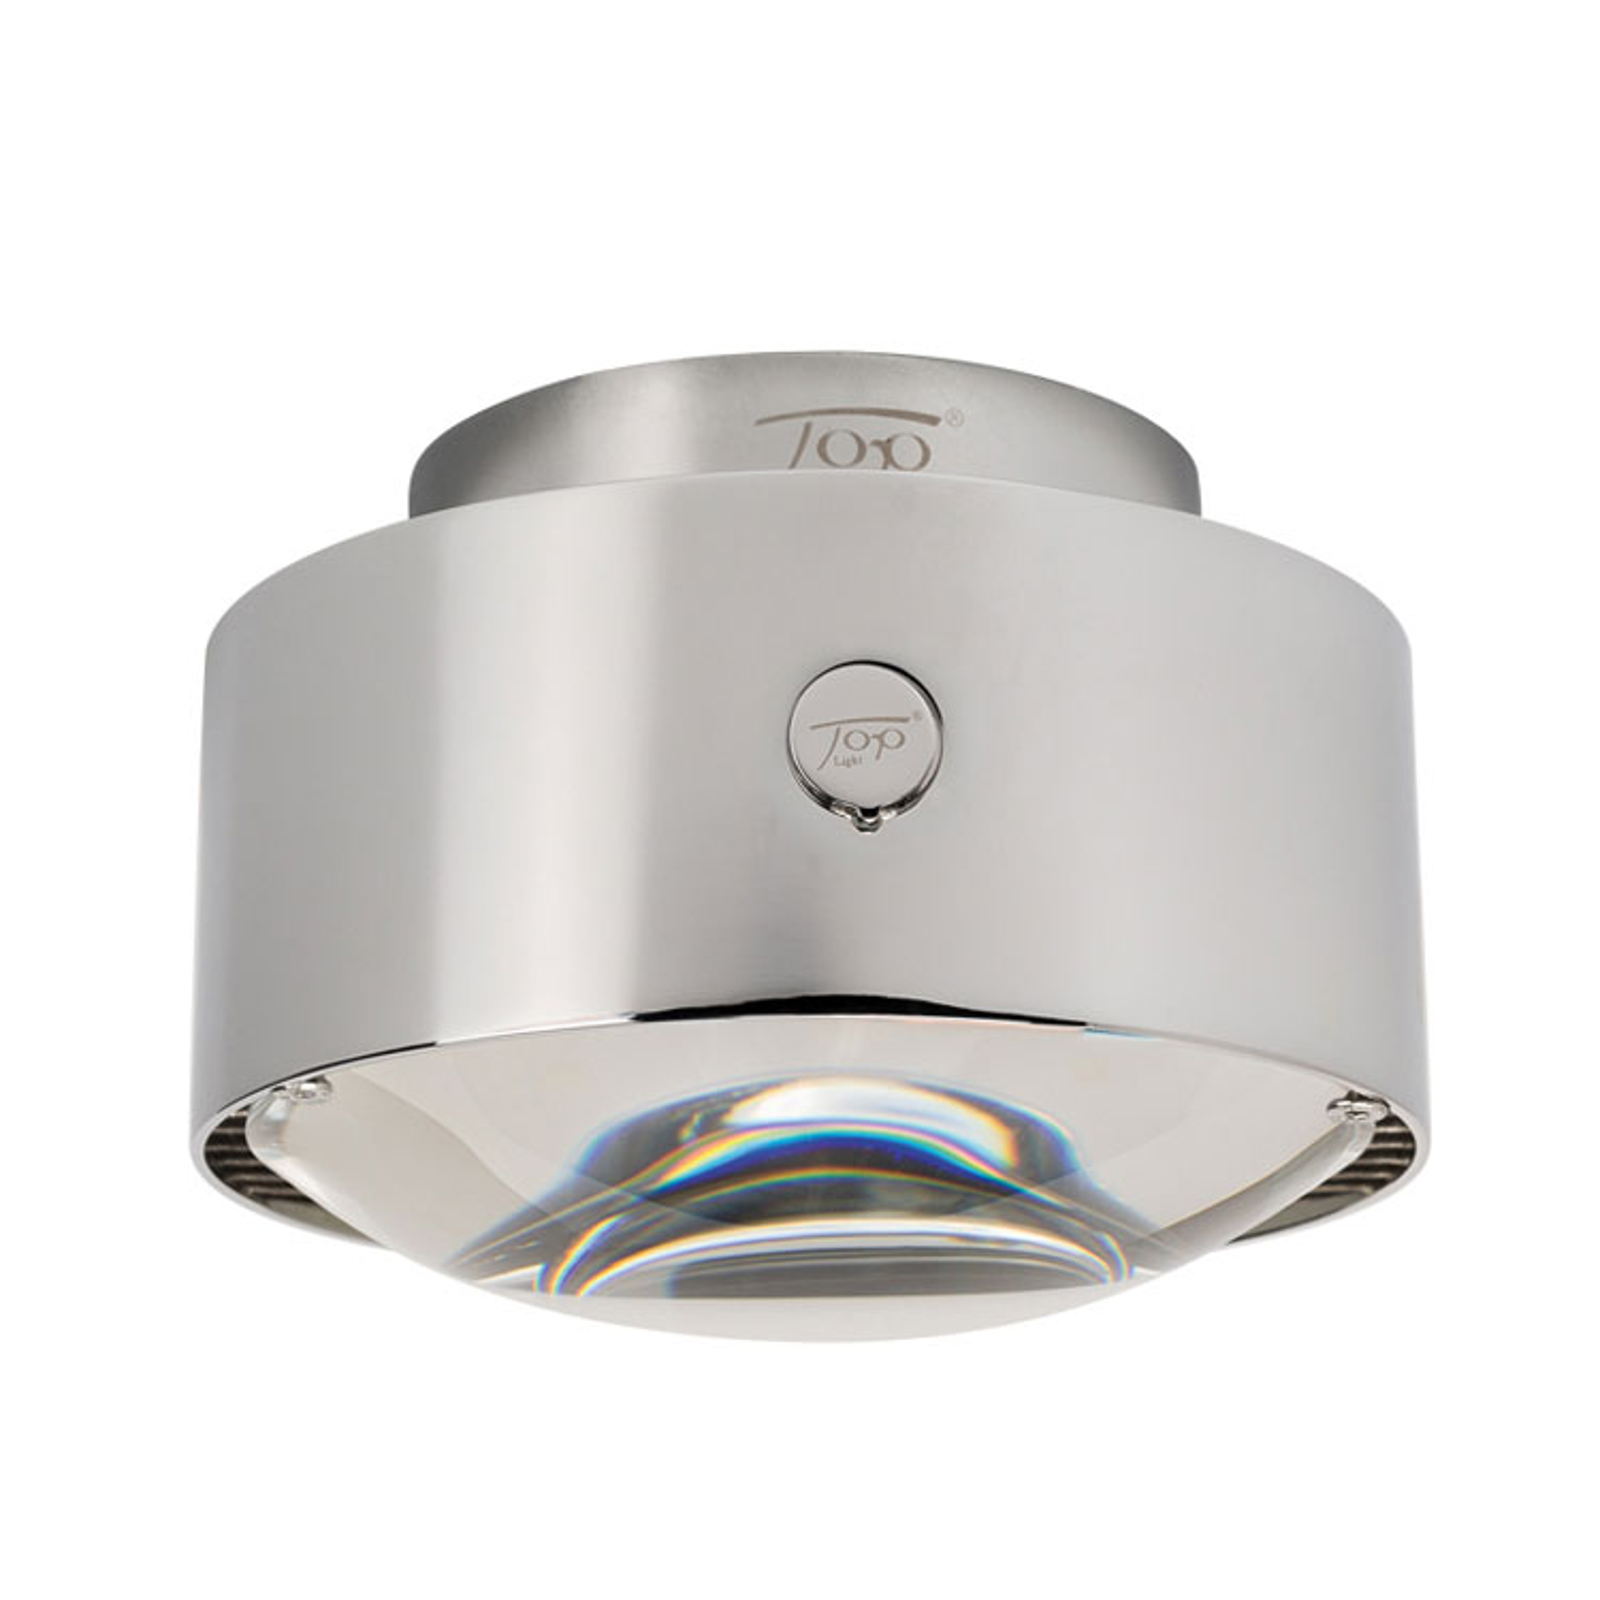 LED-Deckenleuchte Puk Maxx Plus